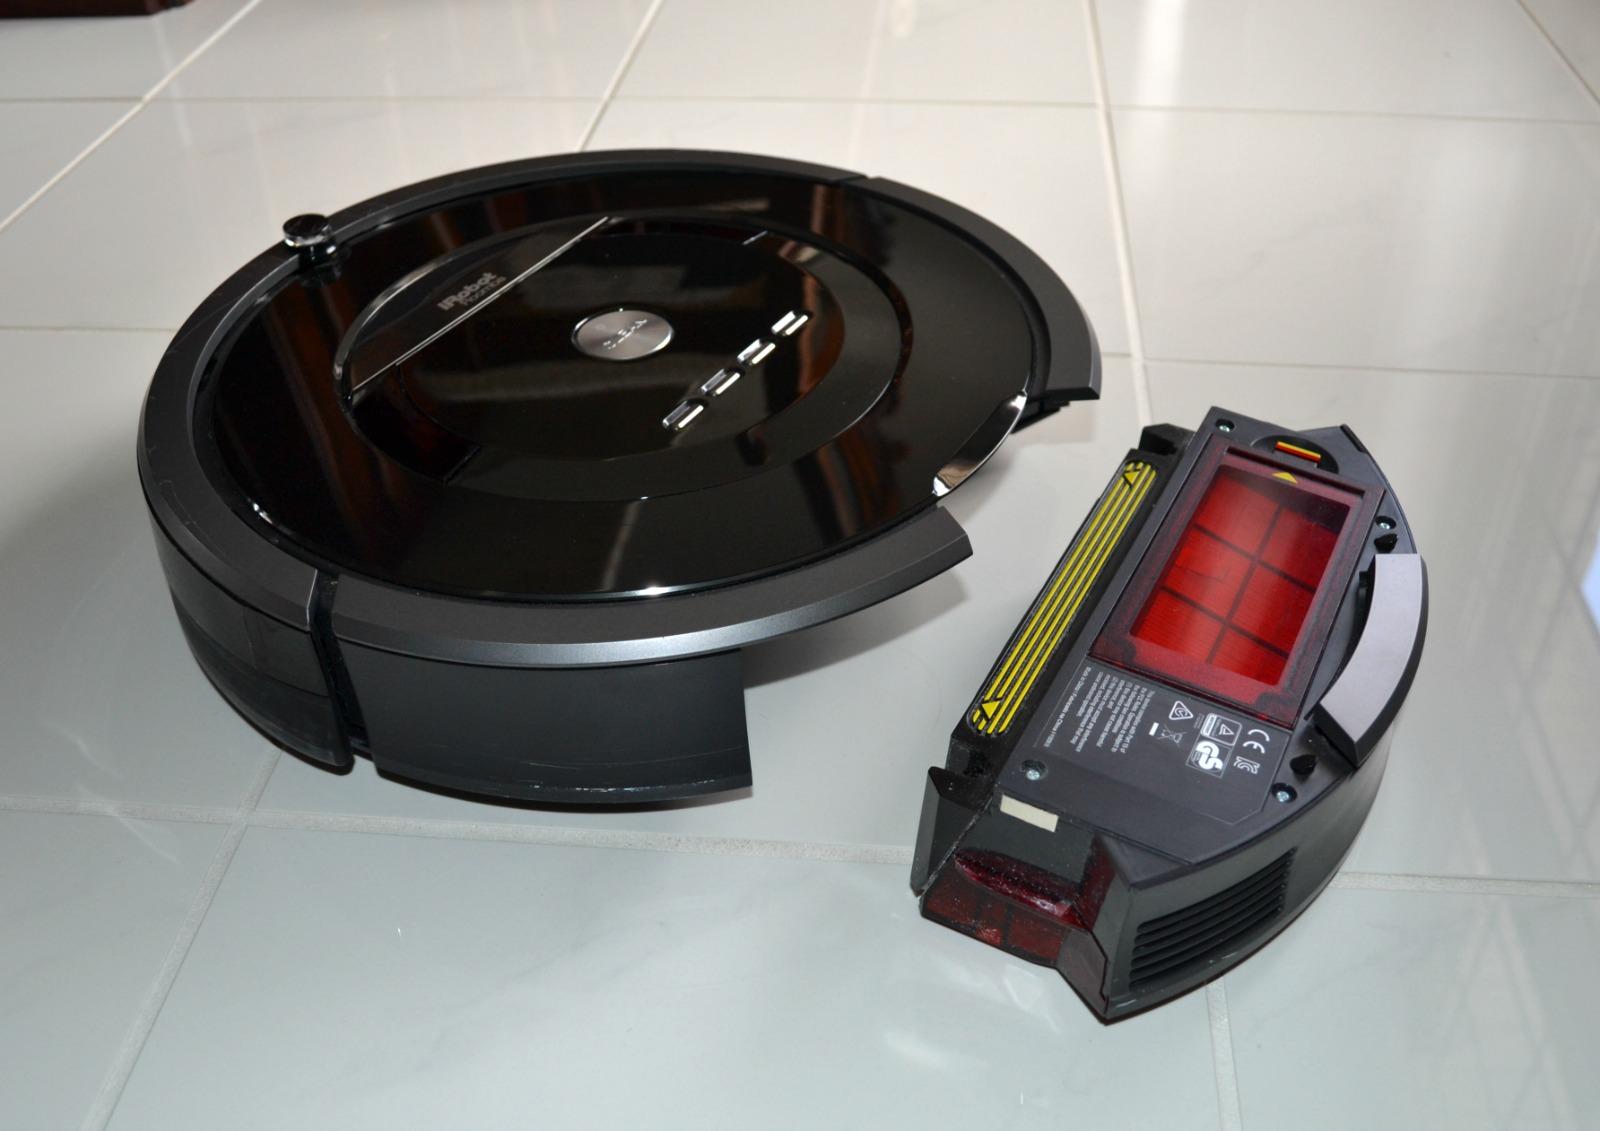 Roomba 880- Product Review - GRANDMA HONEY'S HOUSE